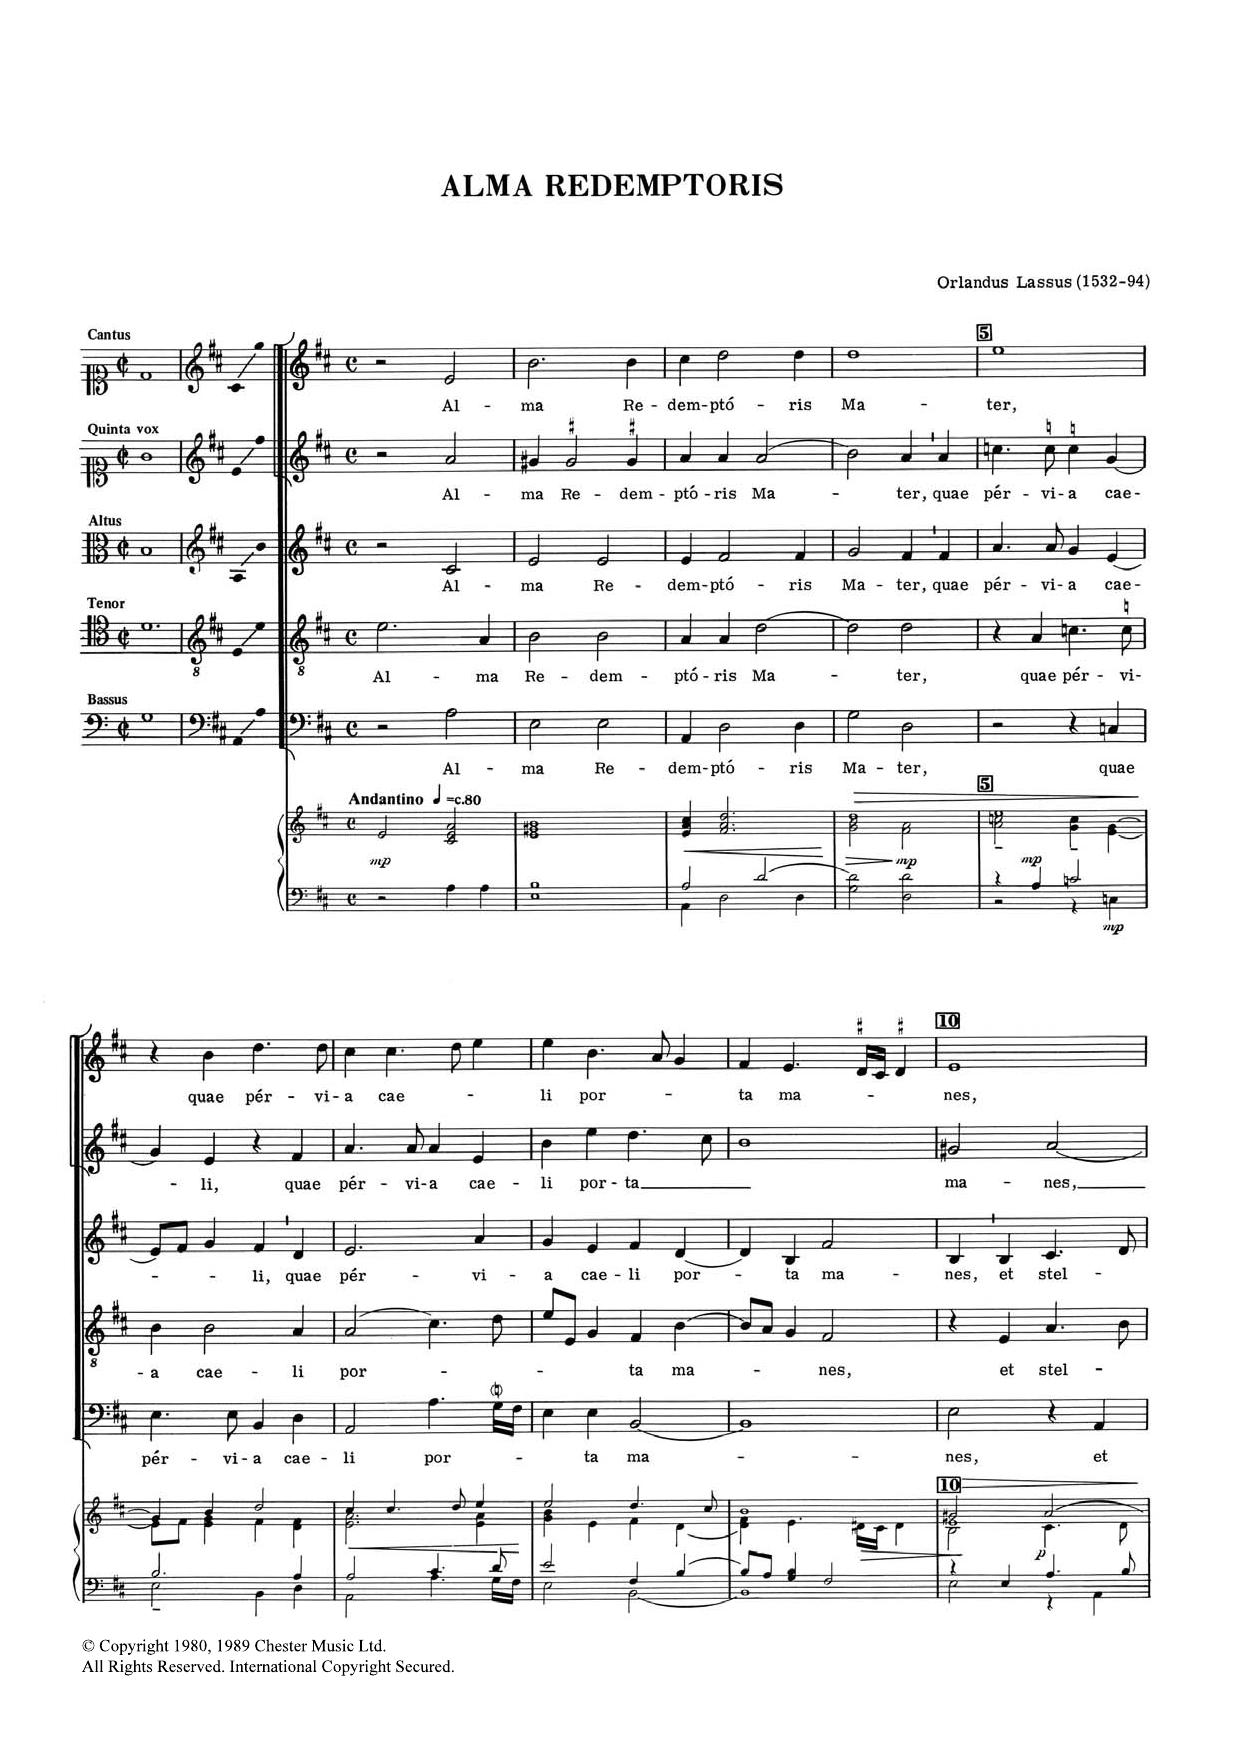 Alma Redemptoris Sheet Music